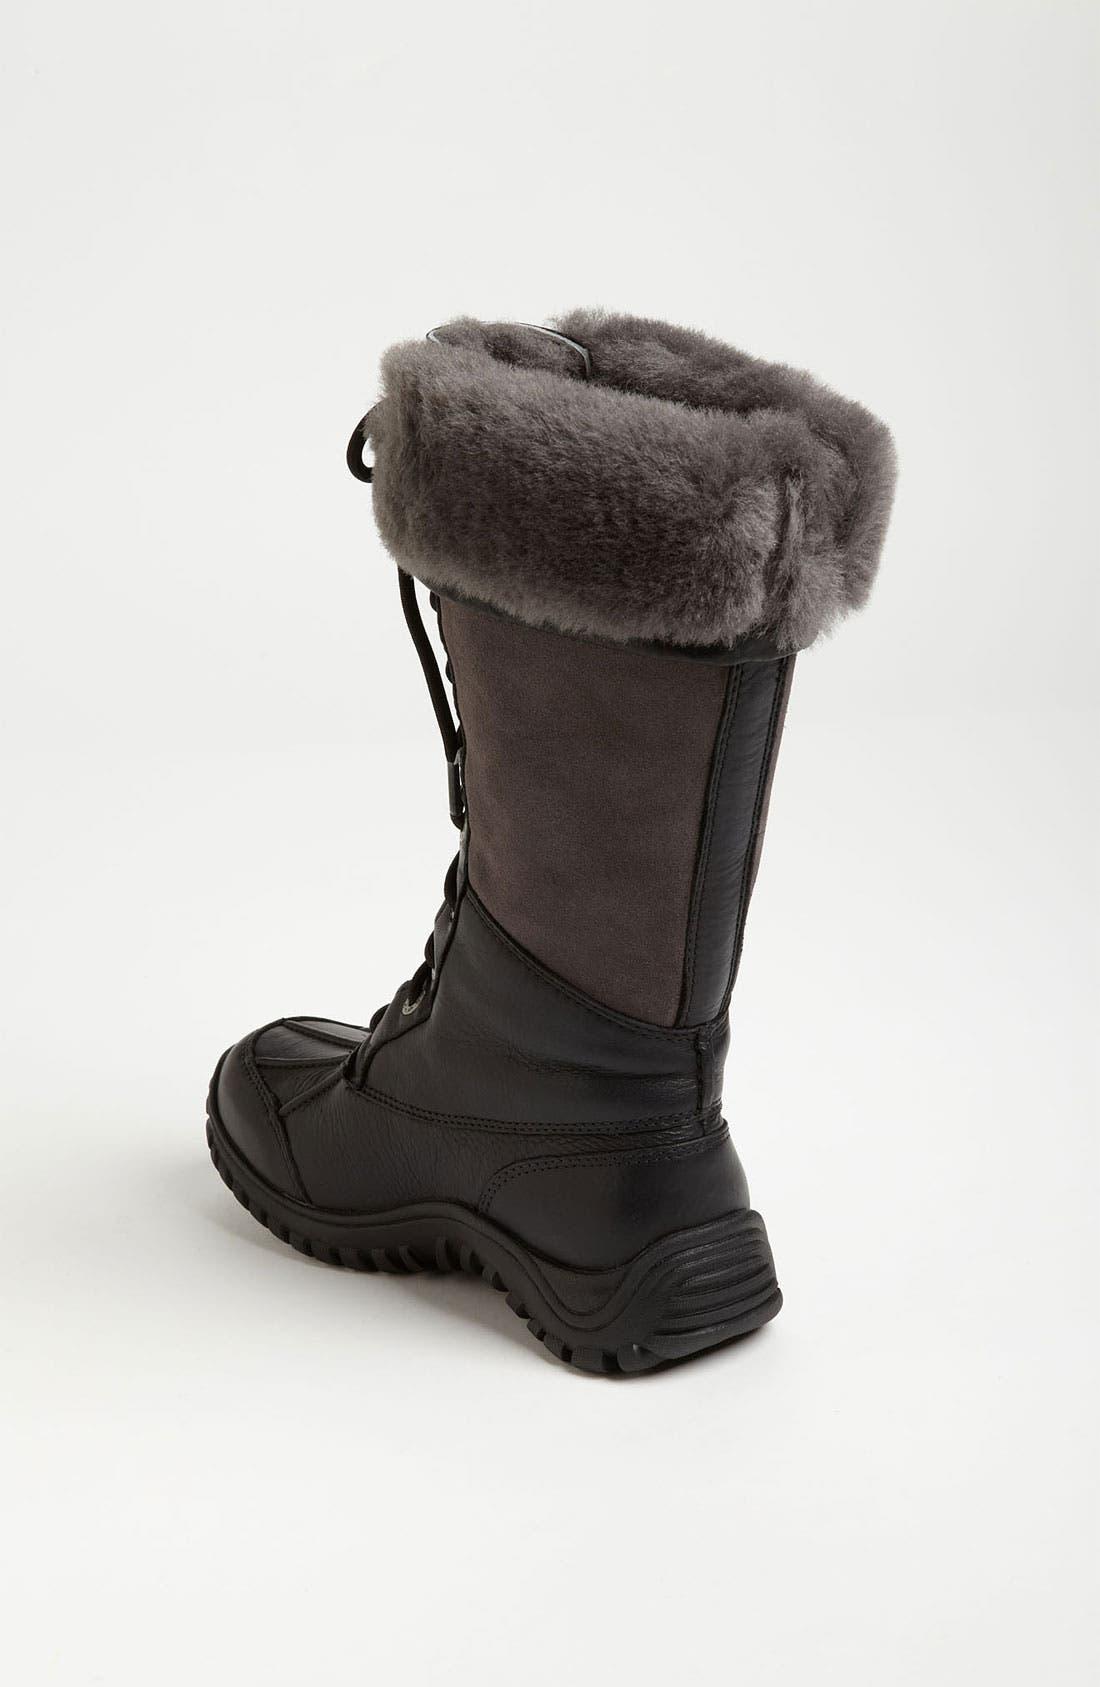 Adirondack Waterproof Tall Boot,                             Alternate thumbnail 3, color,                             New Black